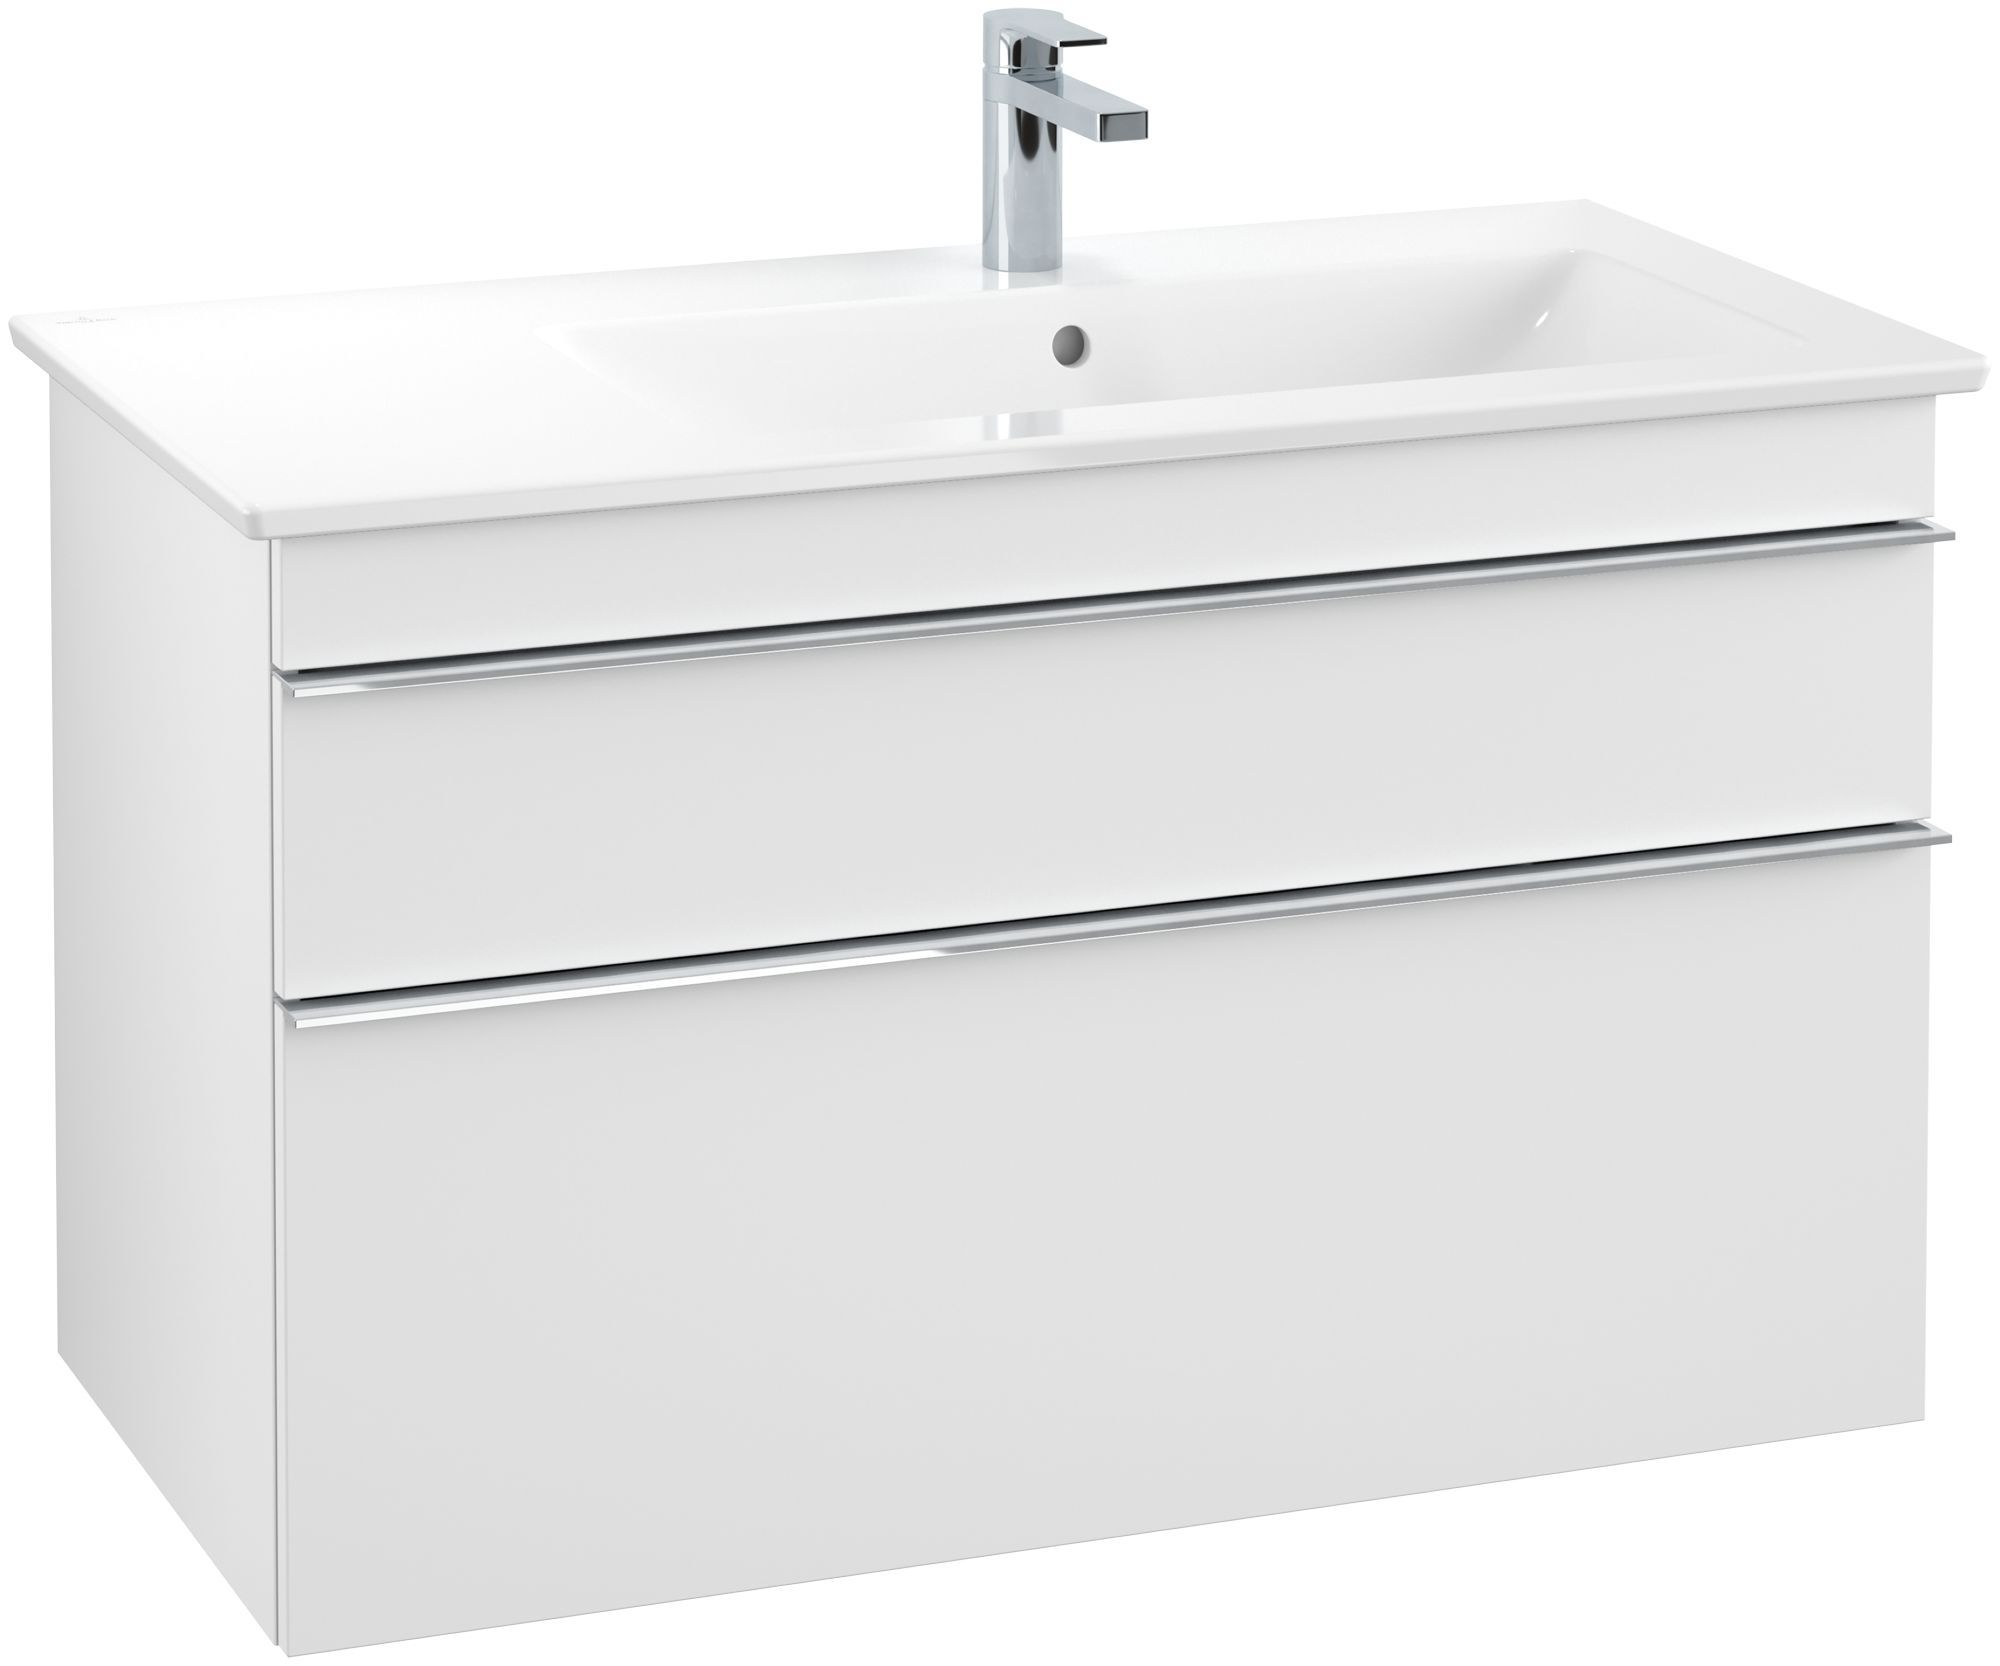 Villeroy & Boch Venticello Waschtischunterschrank 2 Auszüge B:953xT:502xH:590mm weiß matt Griffe chrom A92801MS